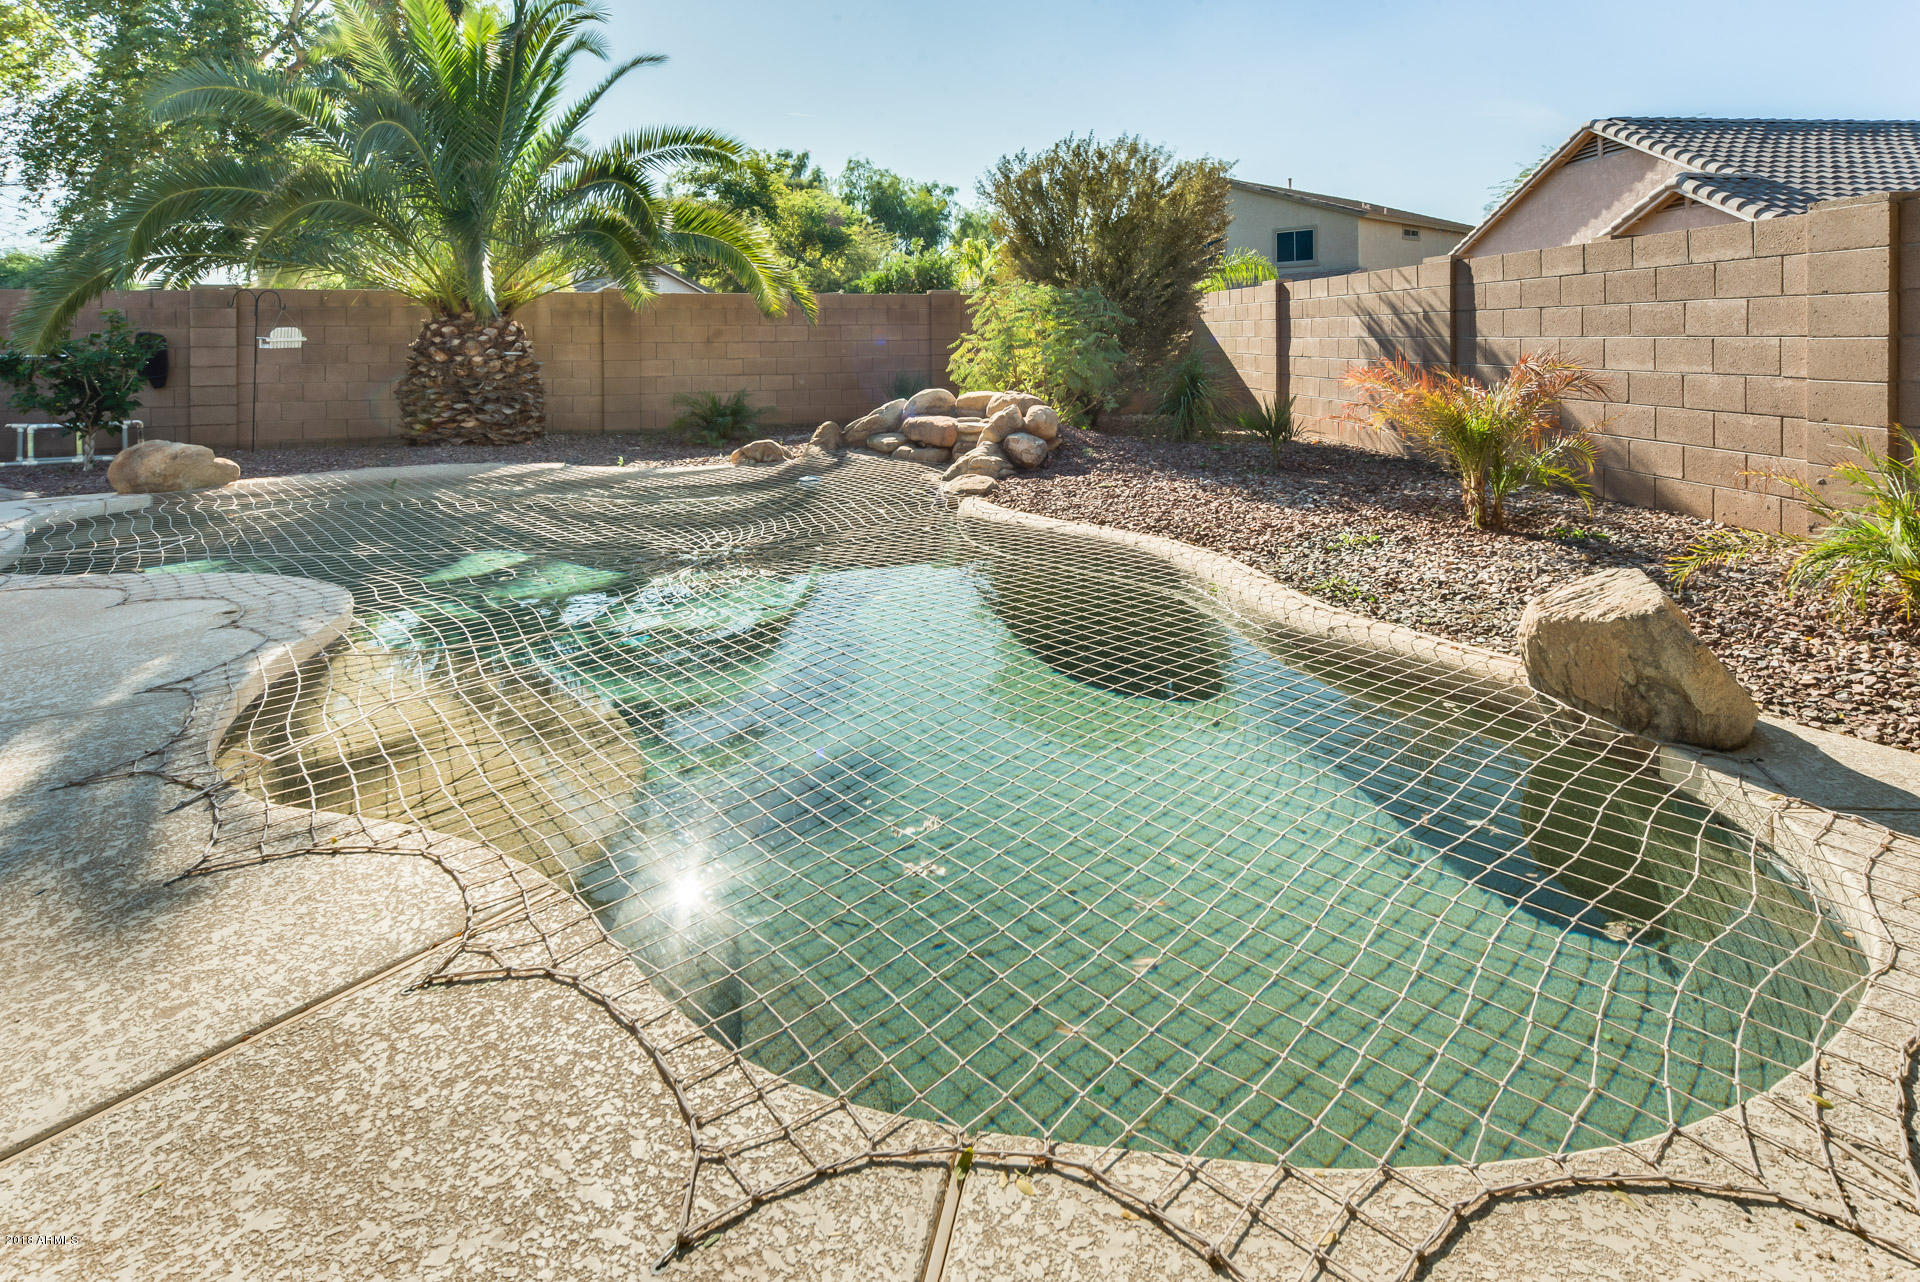 MLS 5857103 2622 S BUCKAROO Trail, Gilbert, AZ 85295 Gilbert AZ Chaparral Estates